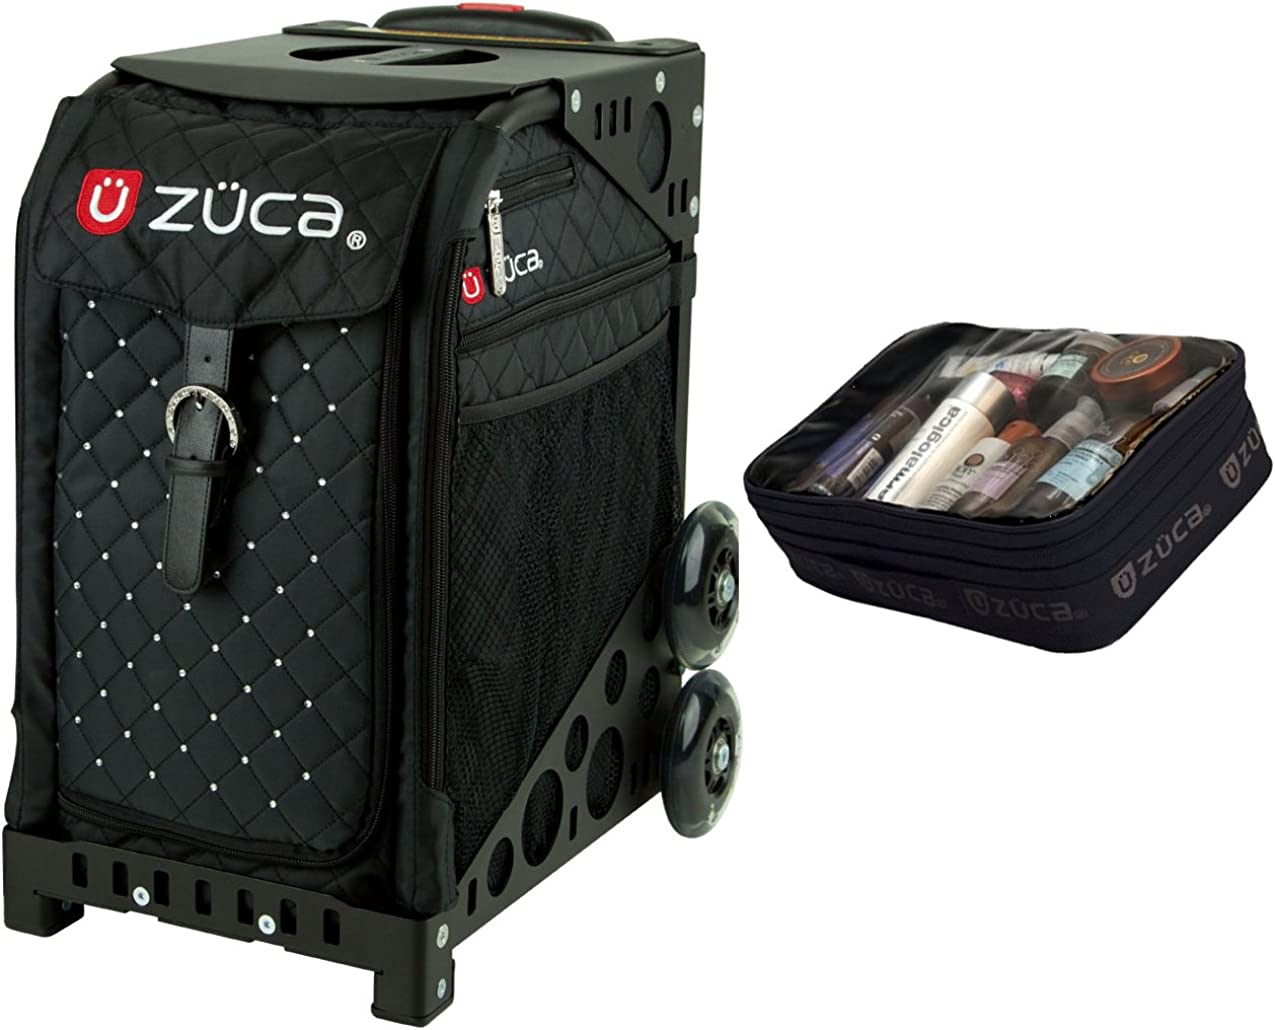 Zuca Mystic Sport Insert Bag with Sport Frame Choose Your Frame Color